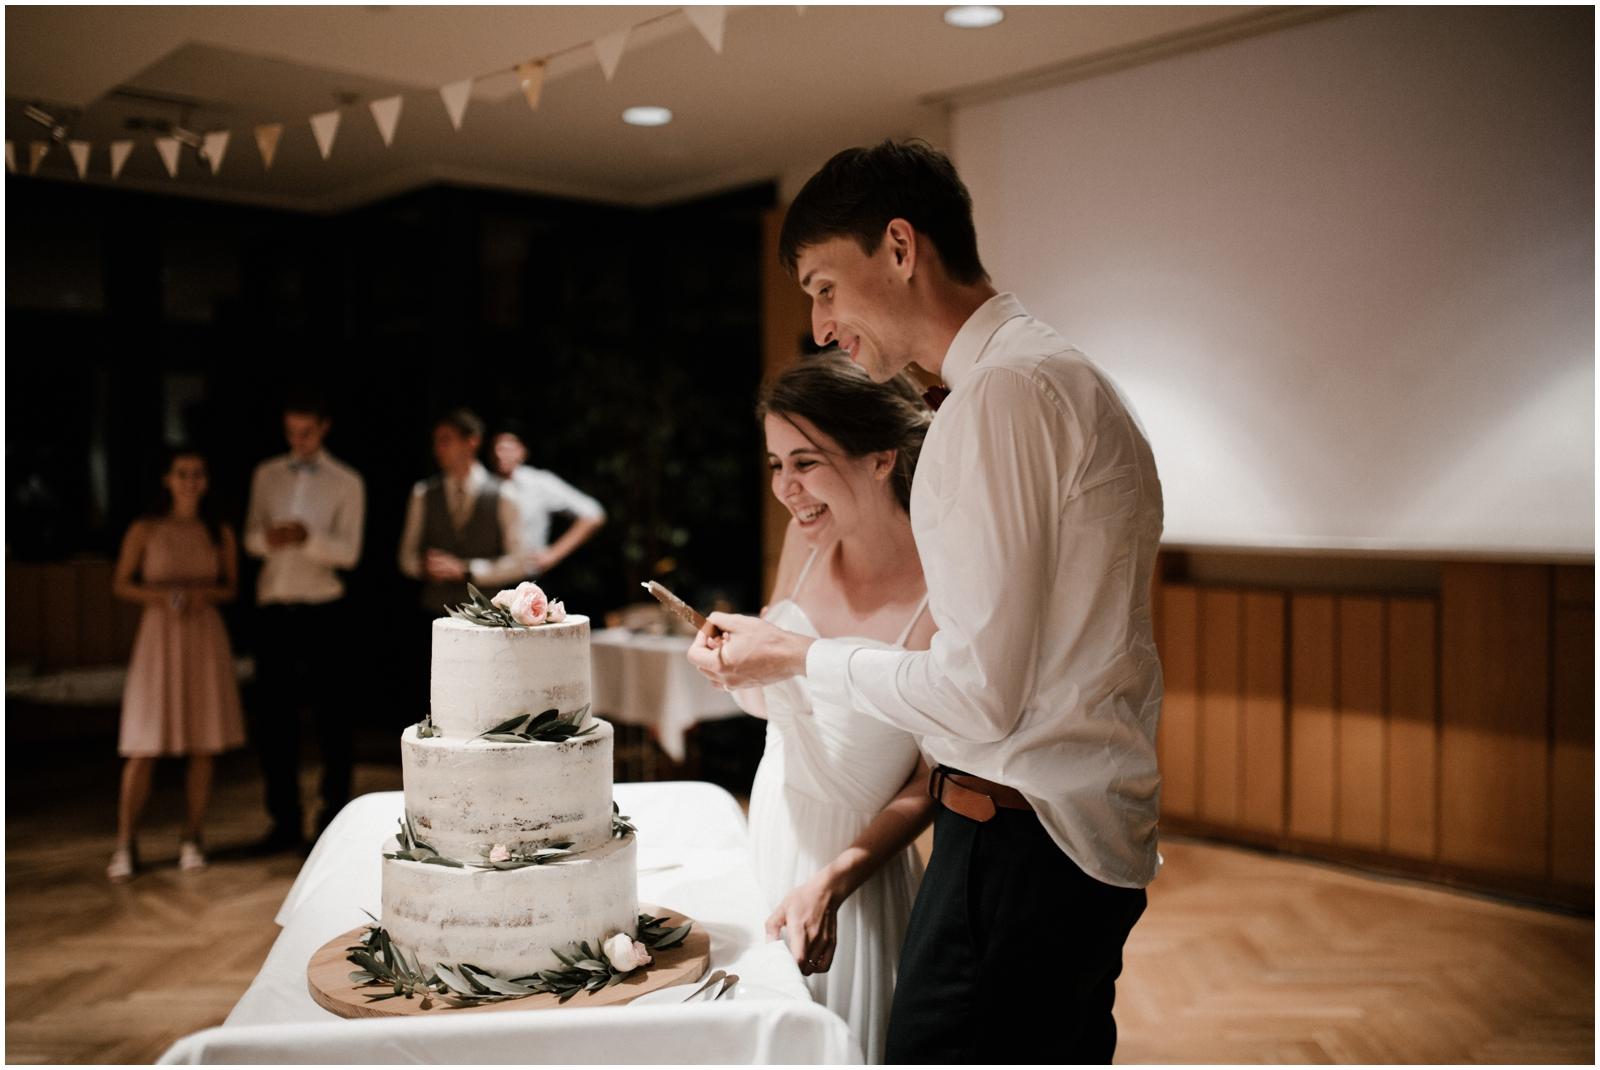 mirjam_thomas_wedding-653.jpg